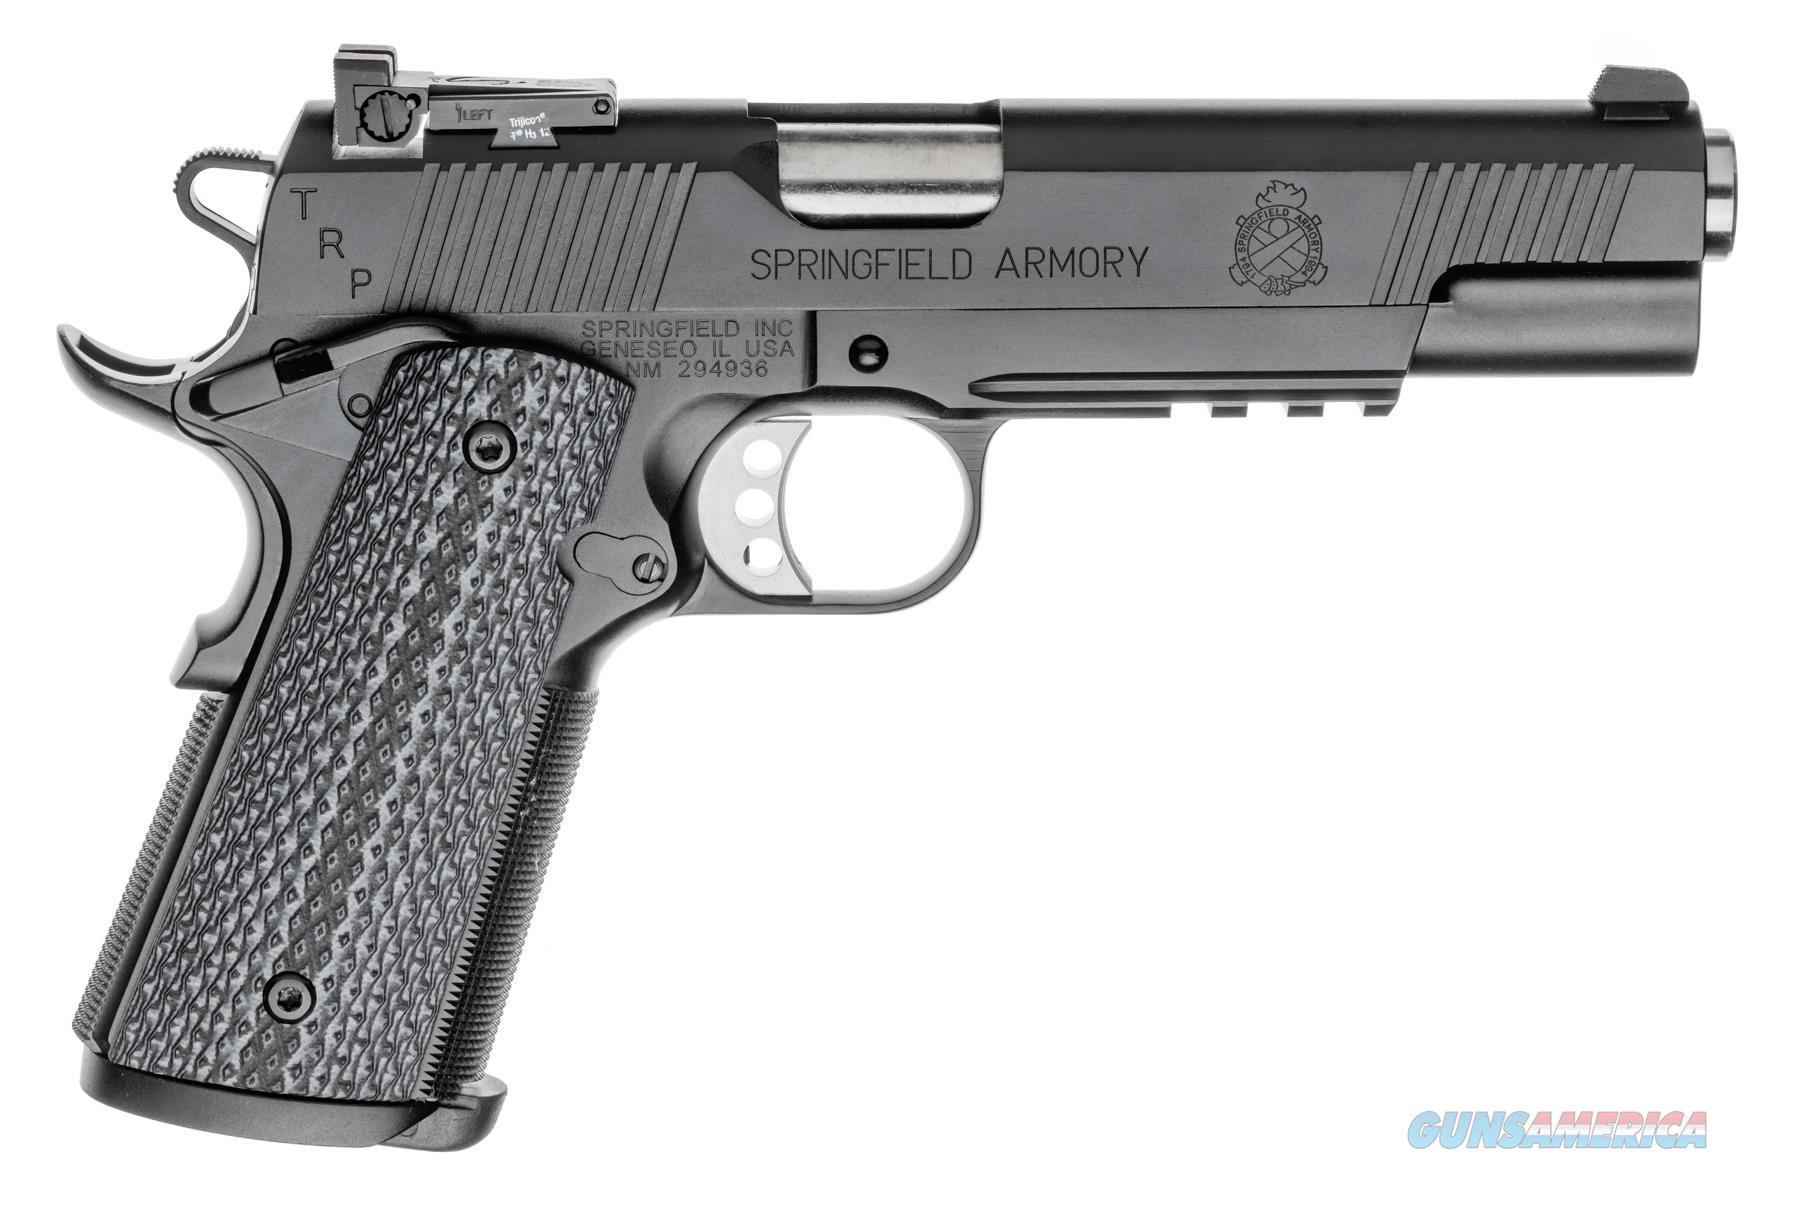 "Springfield 1911 TRP Operator .45 ACP 5"" w/Rail Black Armory Kote PC9105L18   Guns > Pistols > Springfield Armory Pistols > 1911 Type"